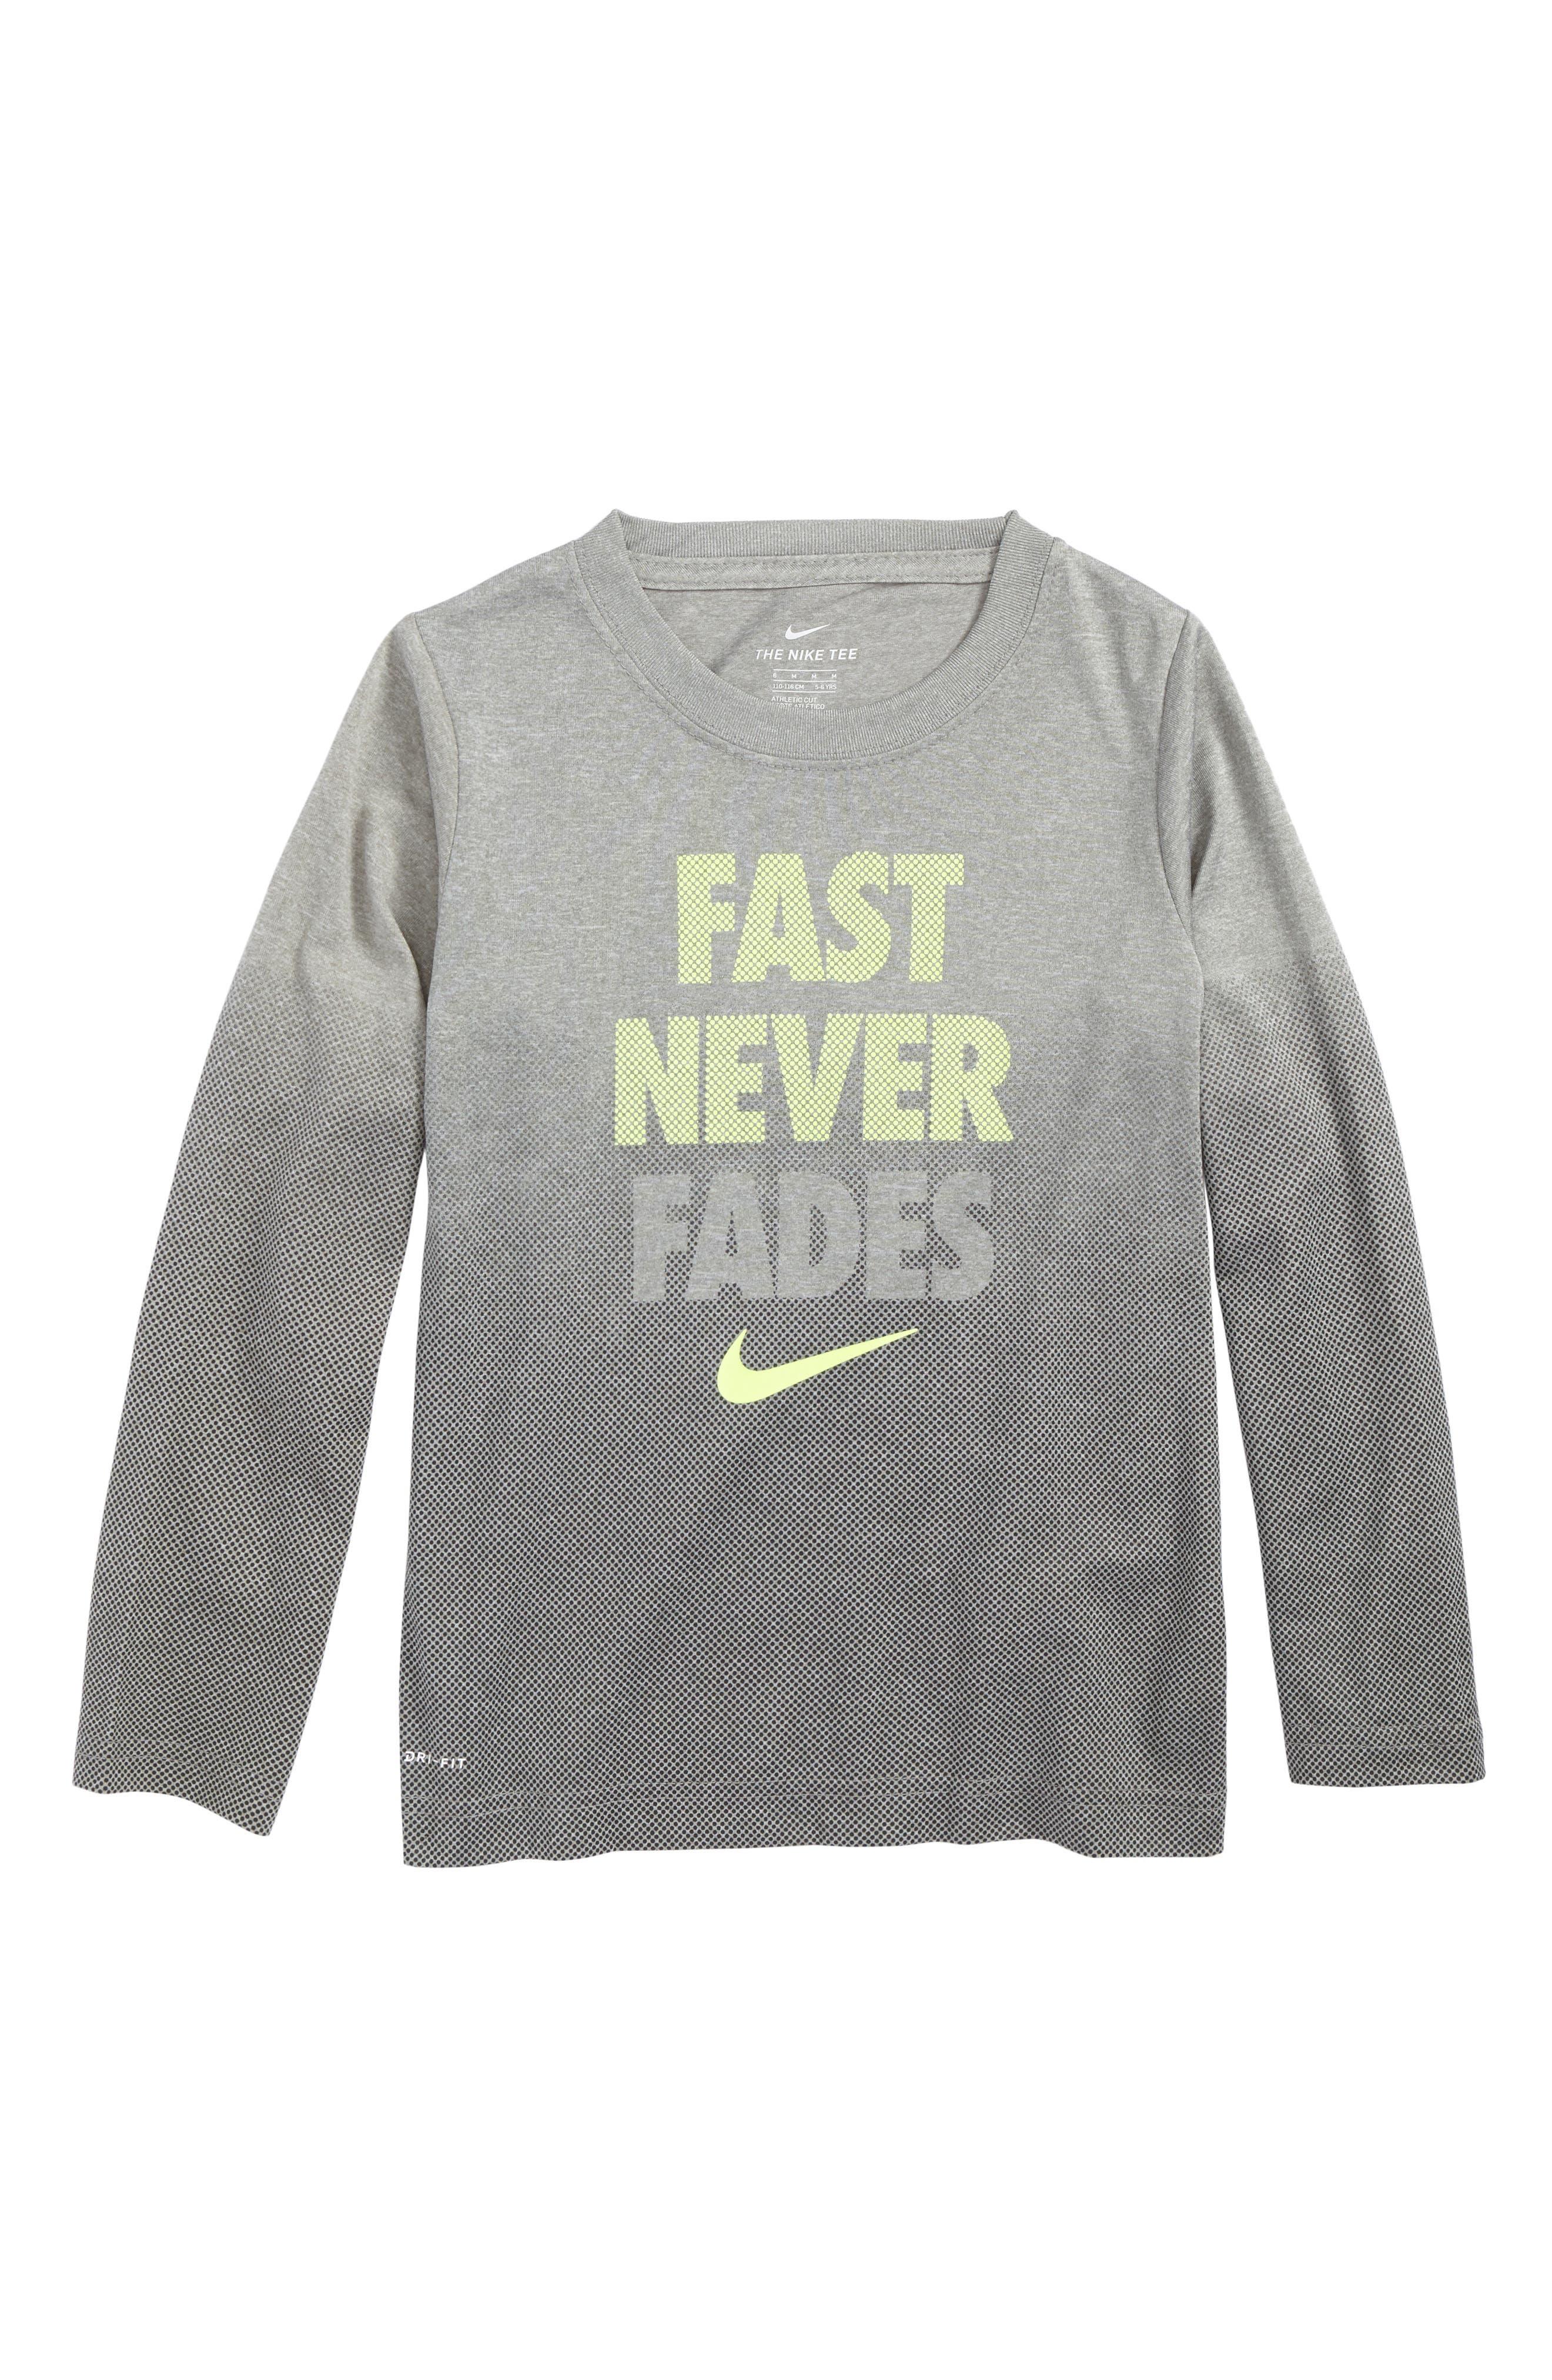 Fast Never Fades Long Sleeve T-Shirt,                             Main thumbnail 1, color,                             088